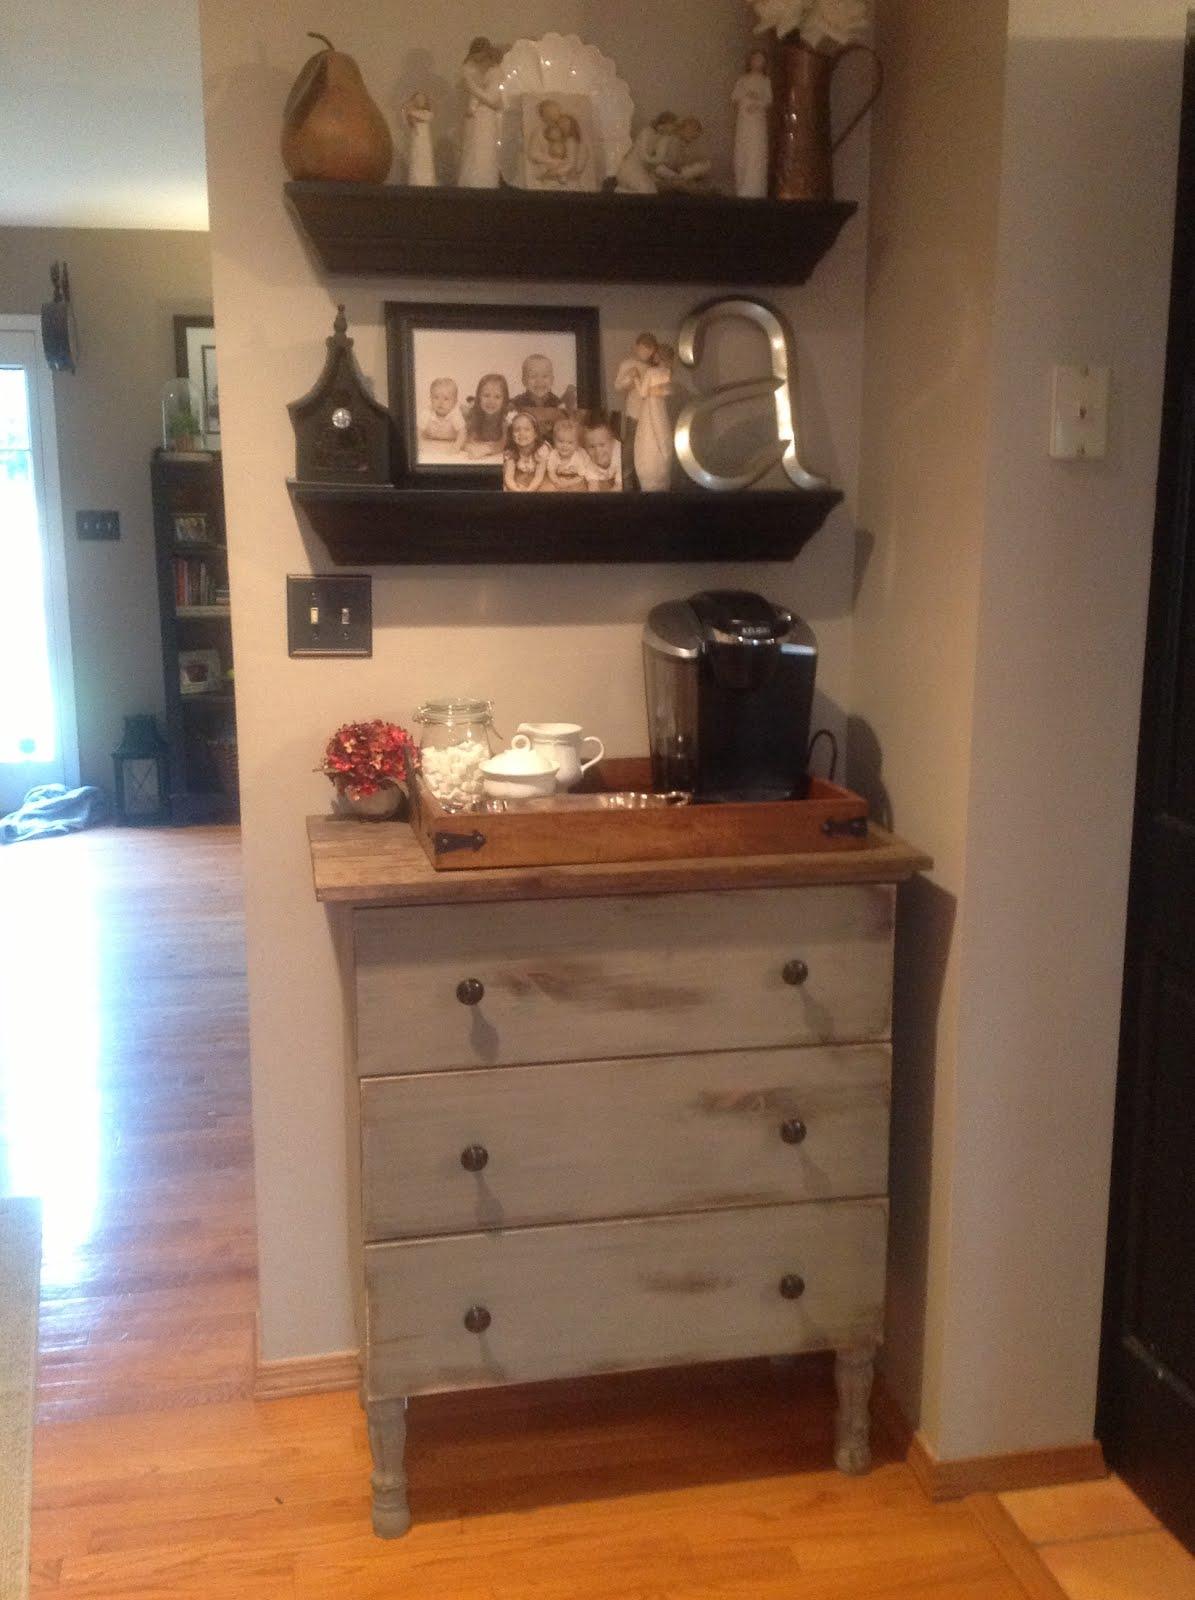 image 733162 Small Kitchen Shelf Ideas